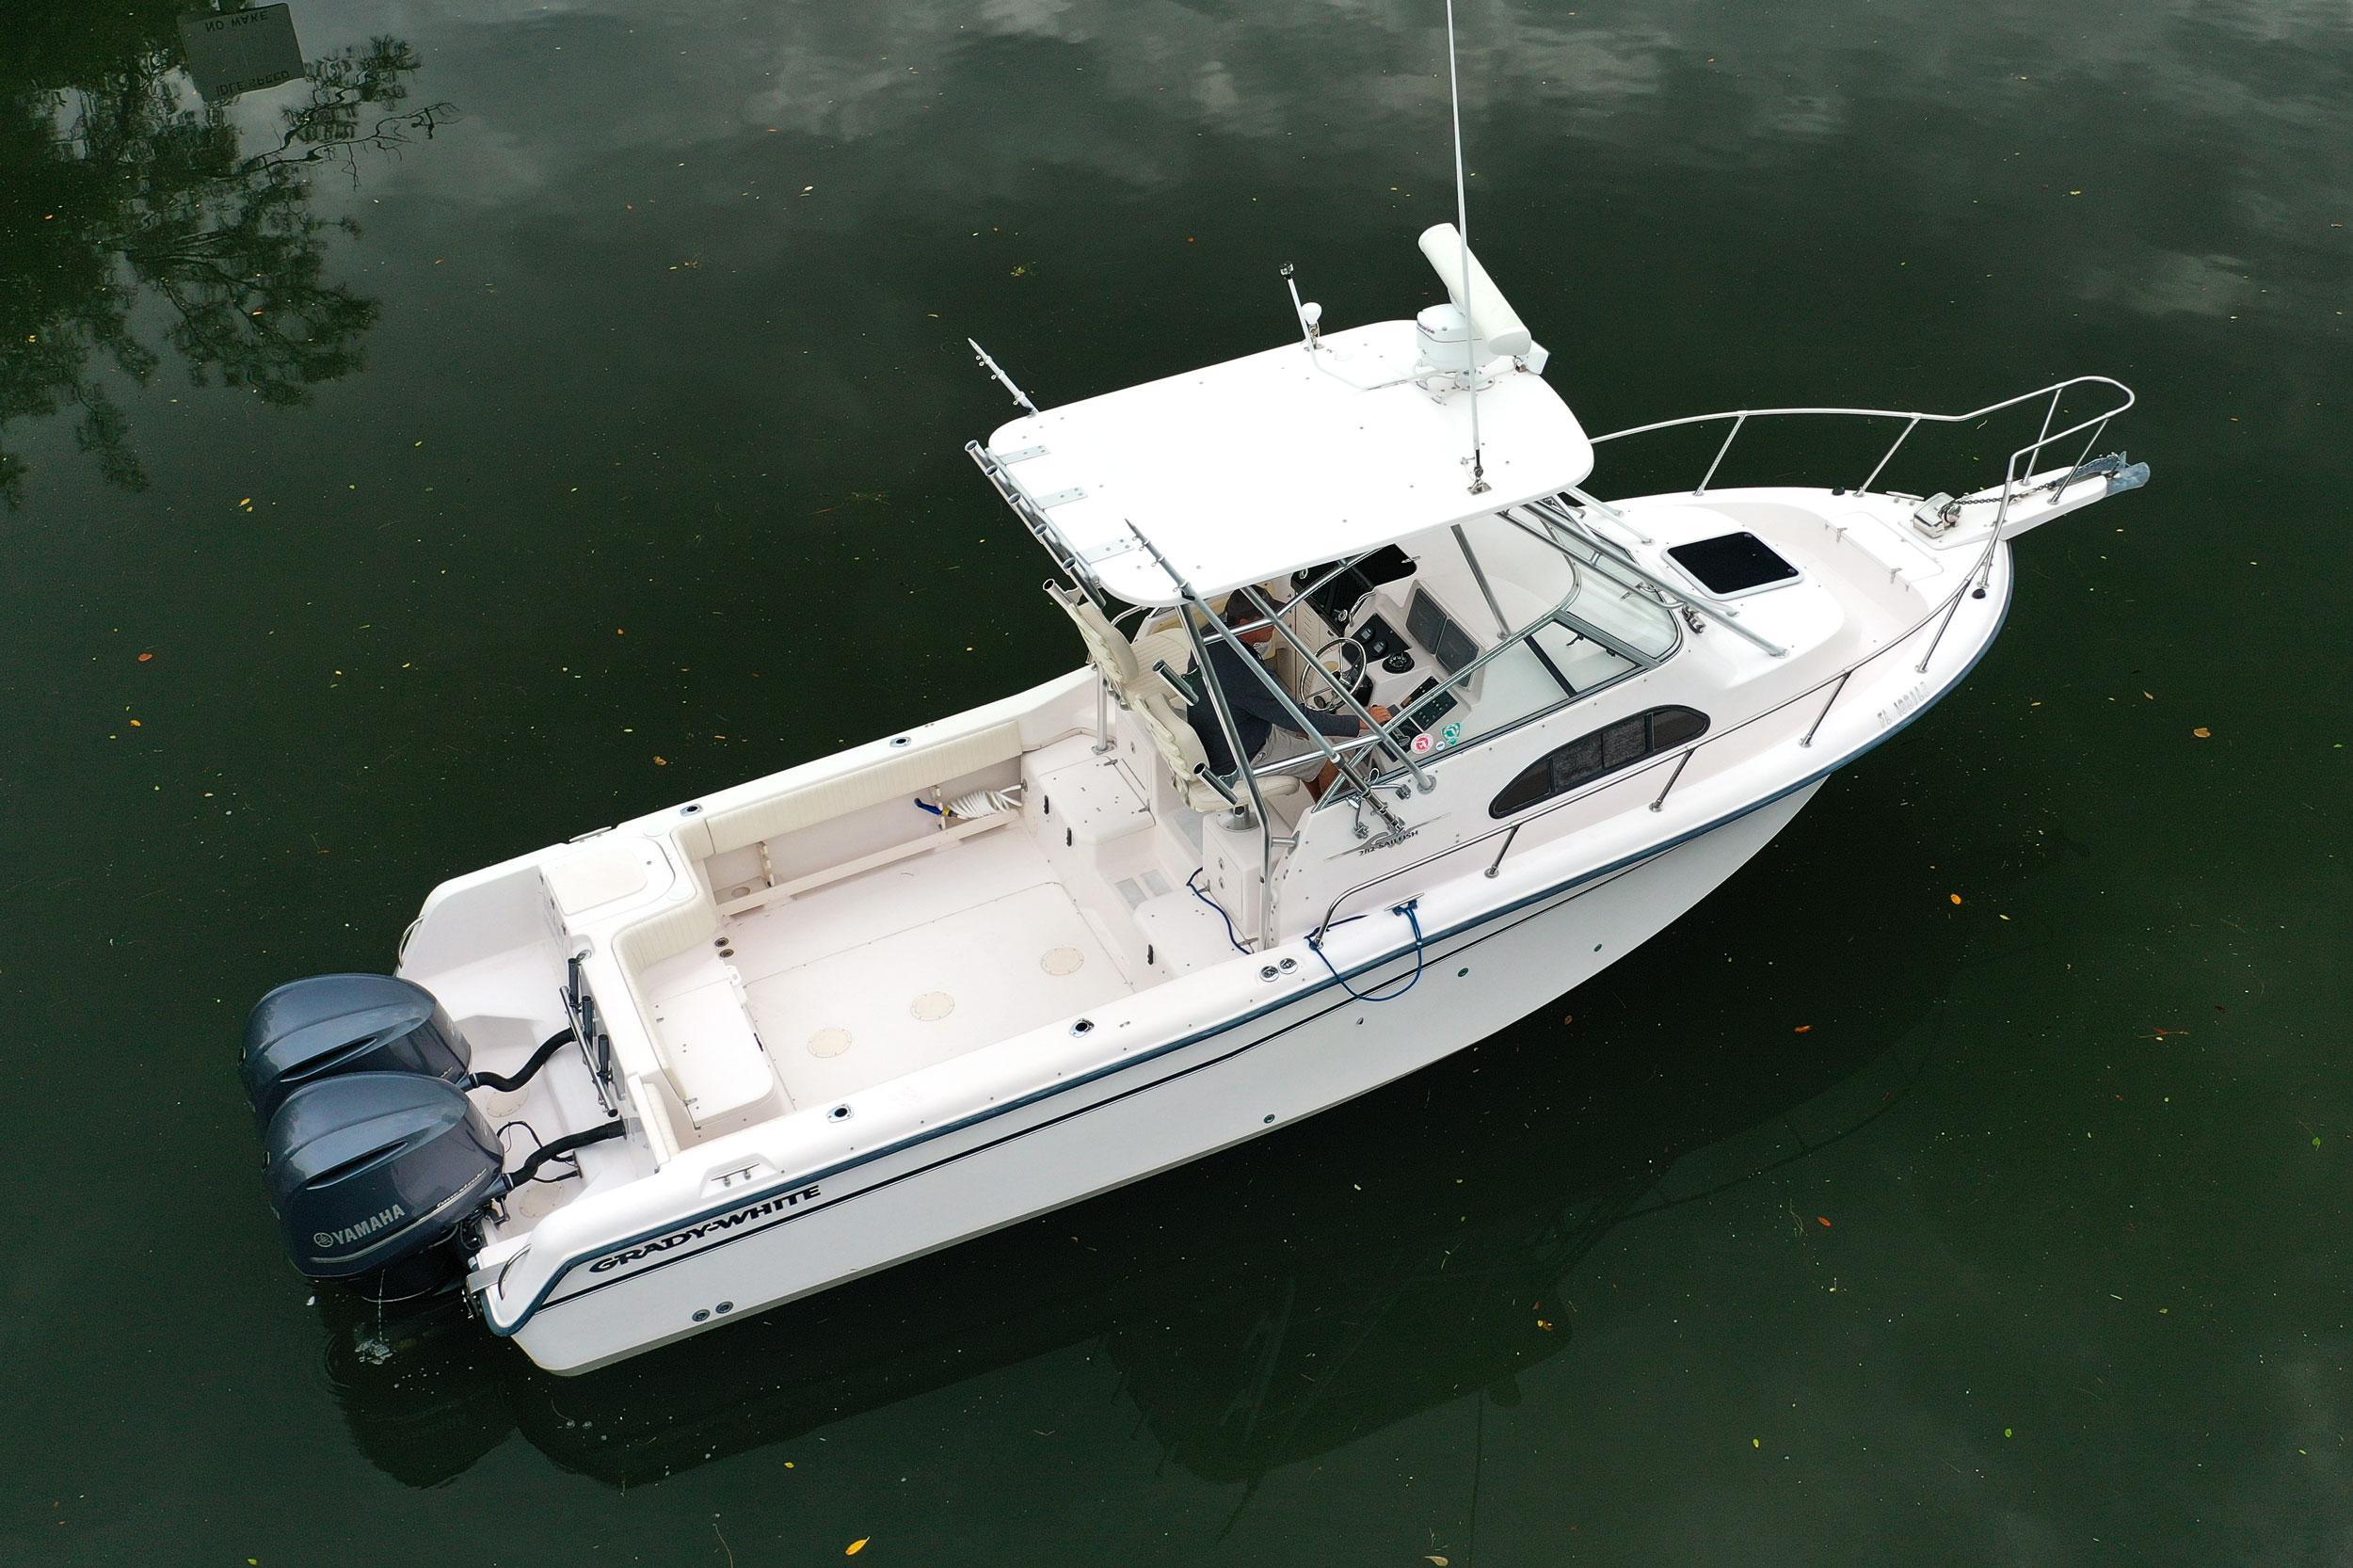 2003 Grady-White Sailfish 282